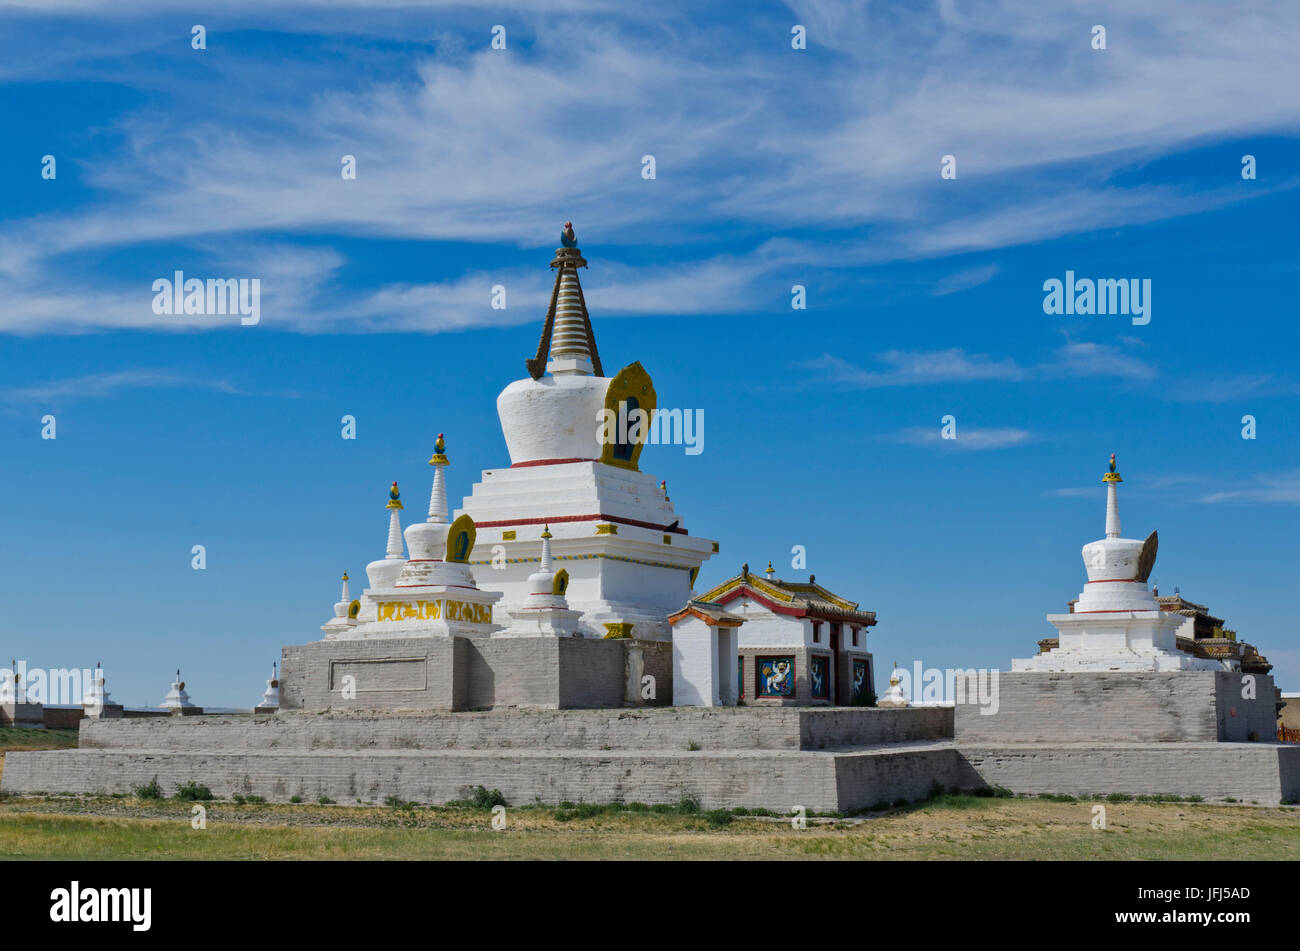 Mongolei, Zentralasien, Karakorum / Kloster Qara Qorum von Erdene Zuu, Hauptstadt des Dschingis Khan Stockbild